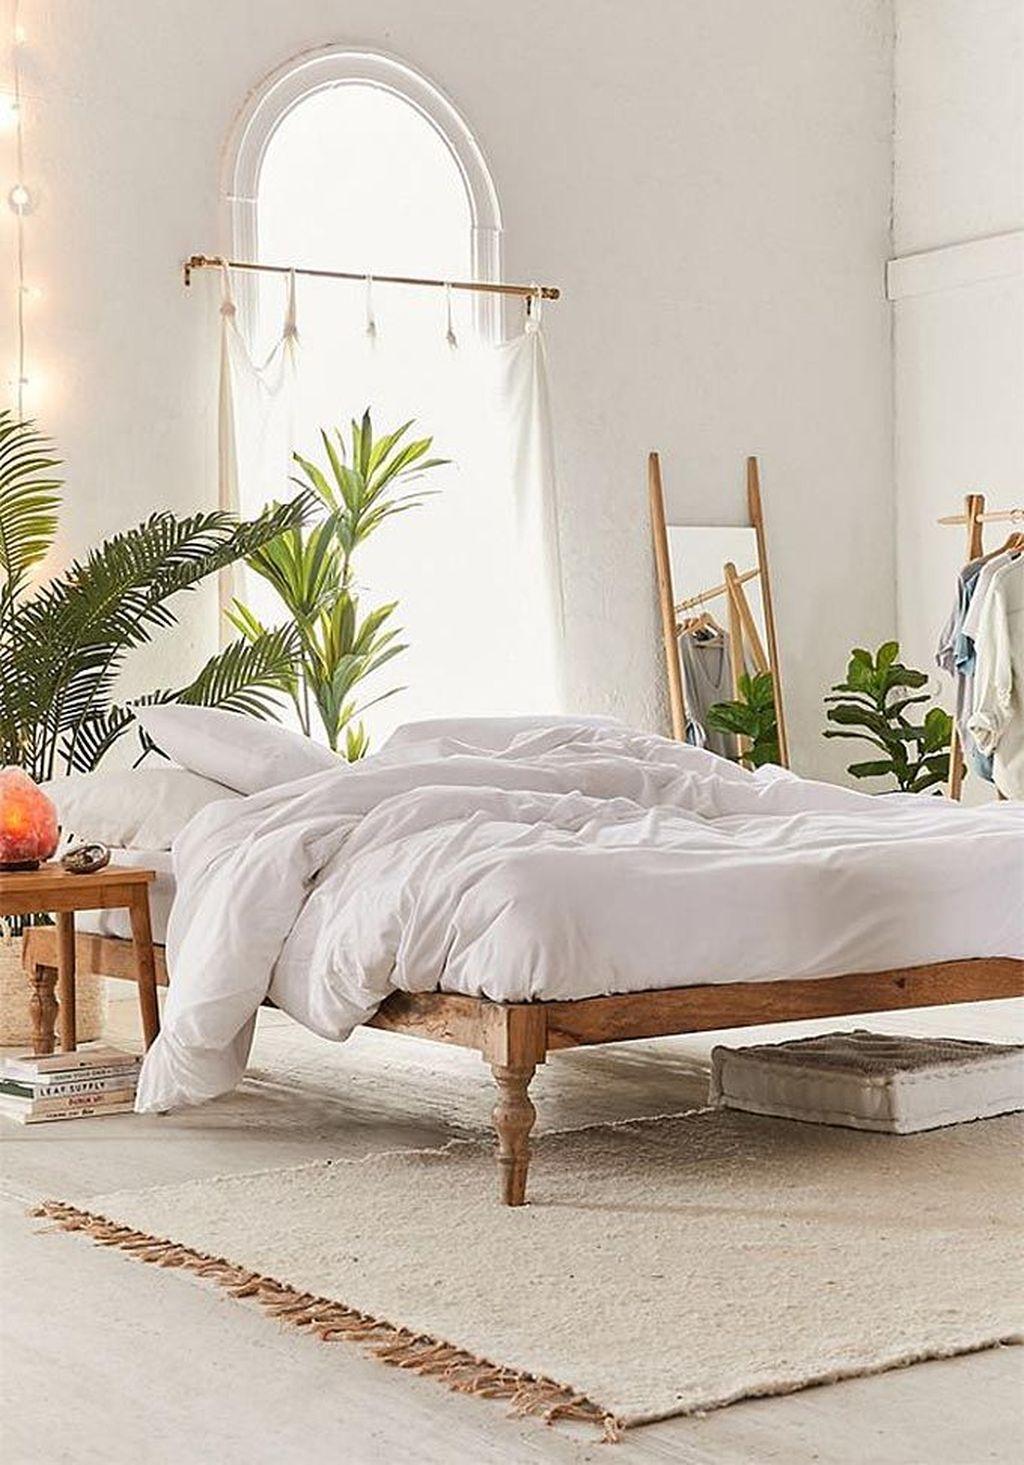 Awesome Boho Chic Bedroom Decor Ideas 29